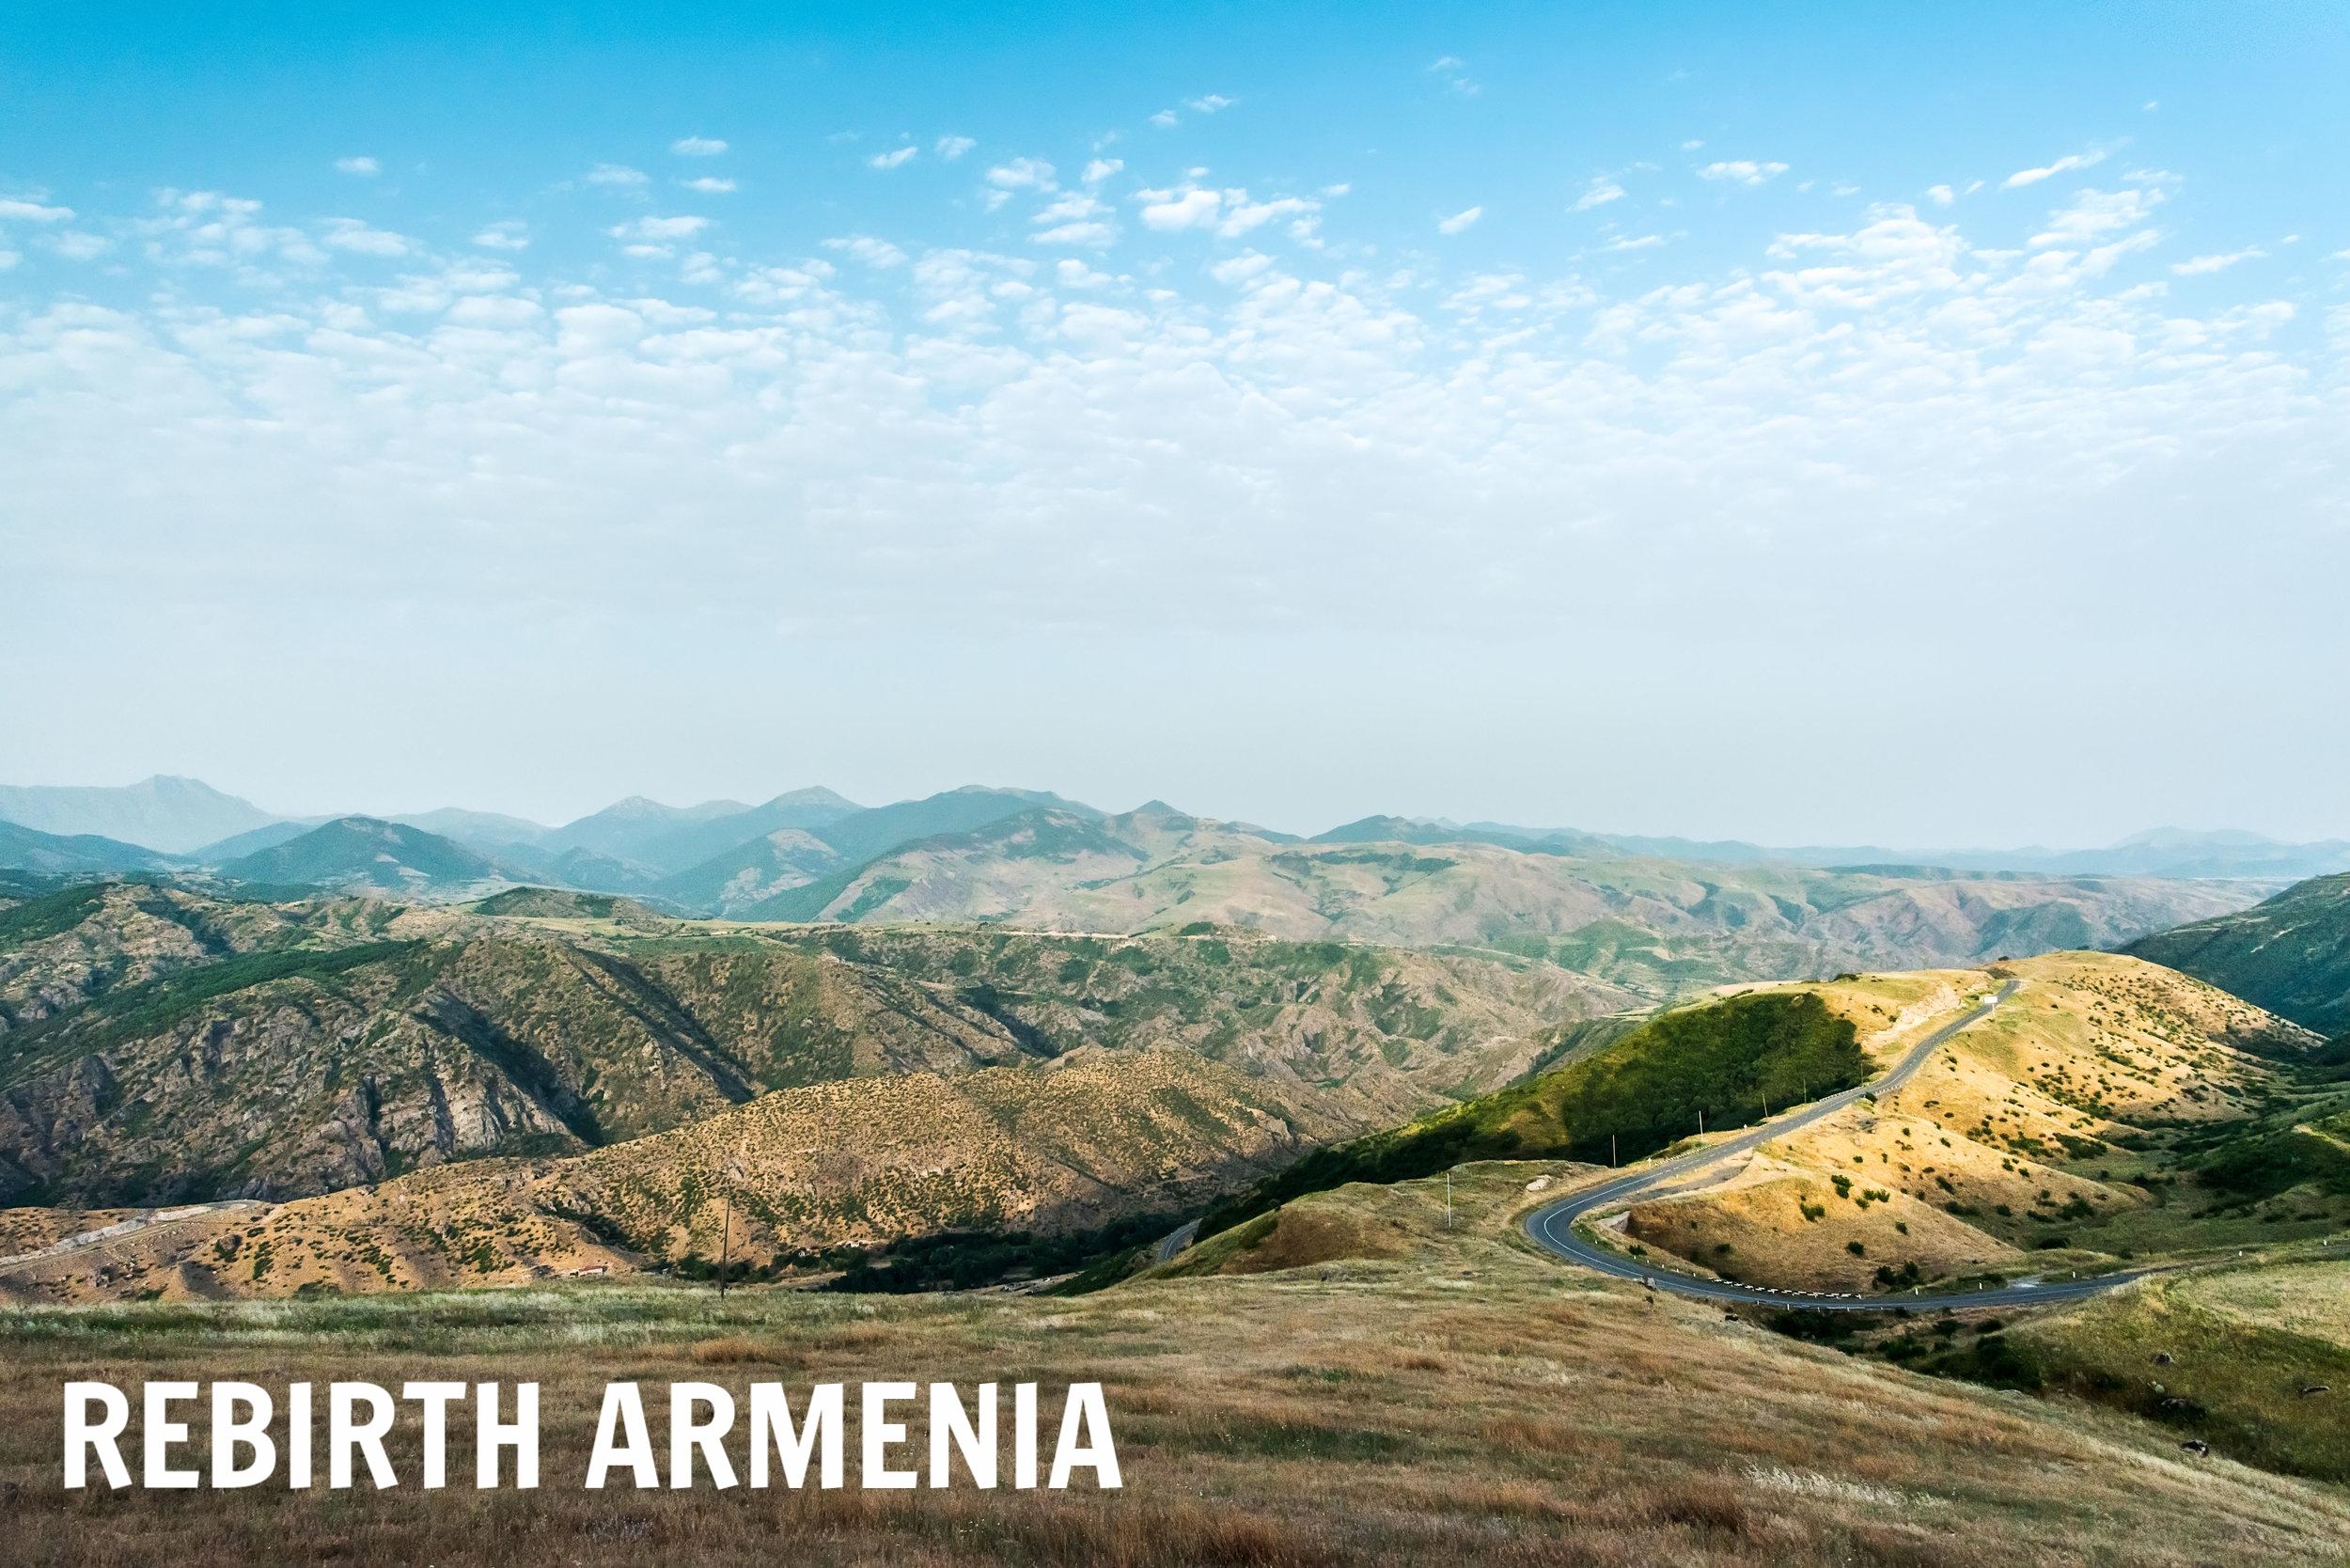 RebirthArmenia-4120.jpg